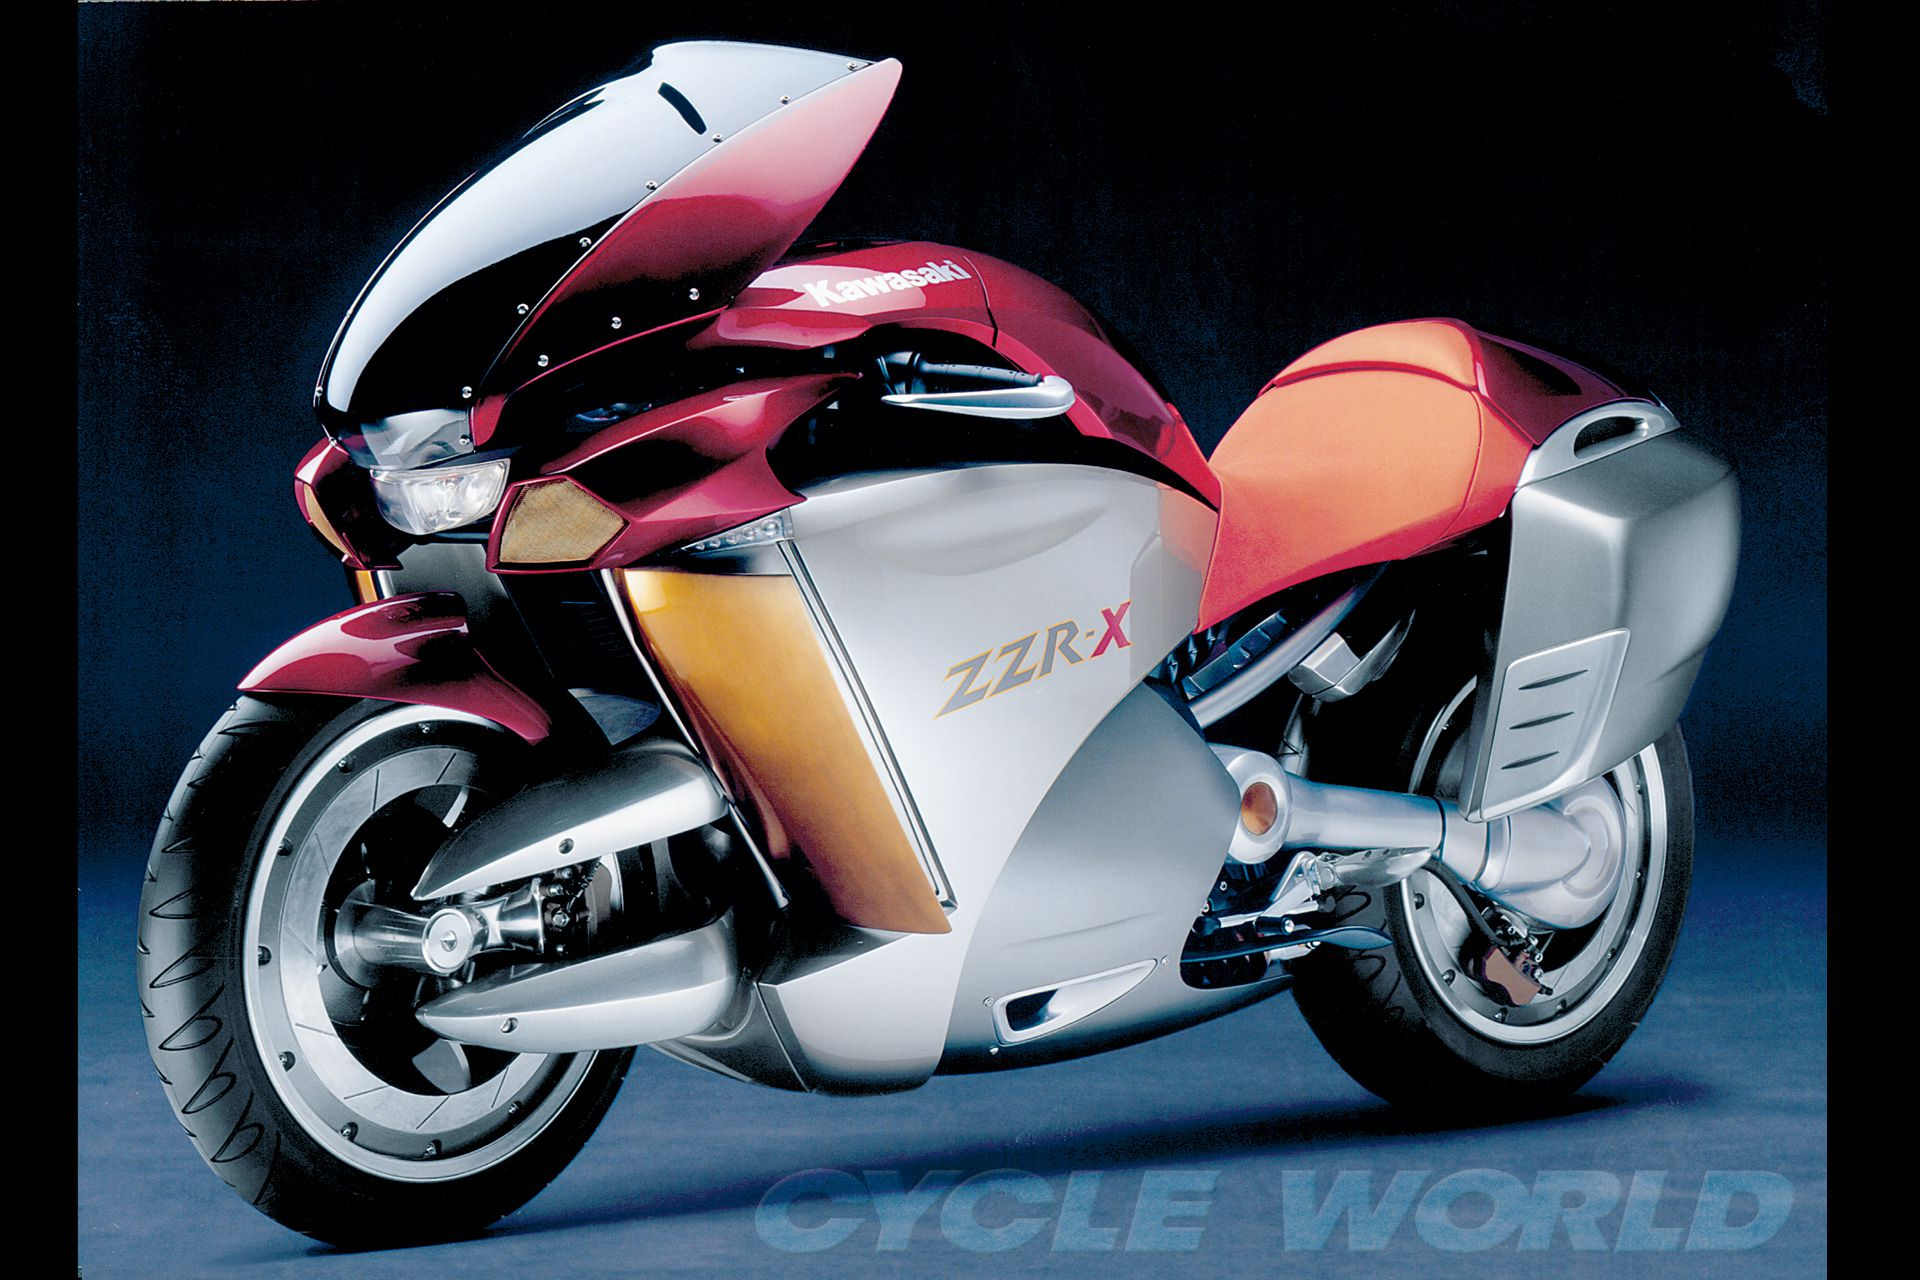 Kawasaki got in the center-hub & adjustable-ergonomics game with its sleek 2004 ZZR-X concept.